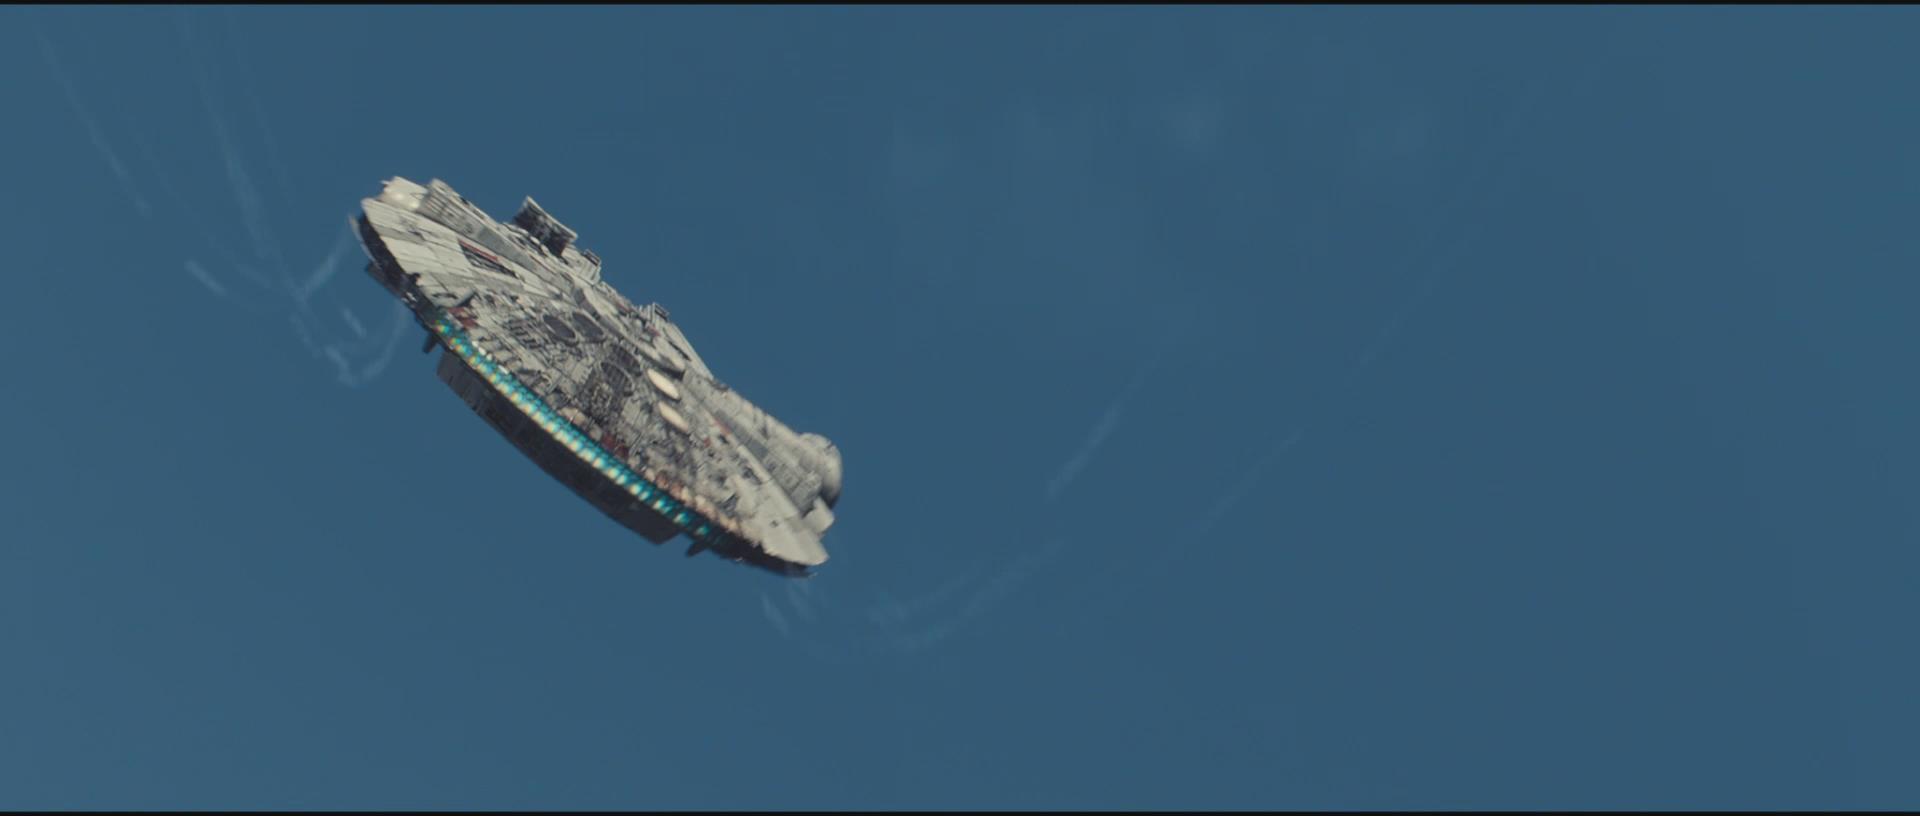 Star Wars – Millennium Falcon Loop-the-Loop